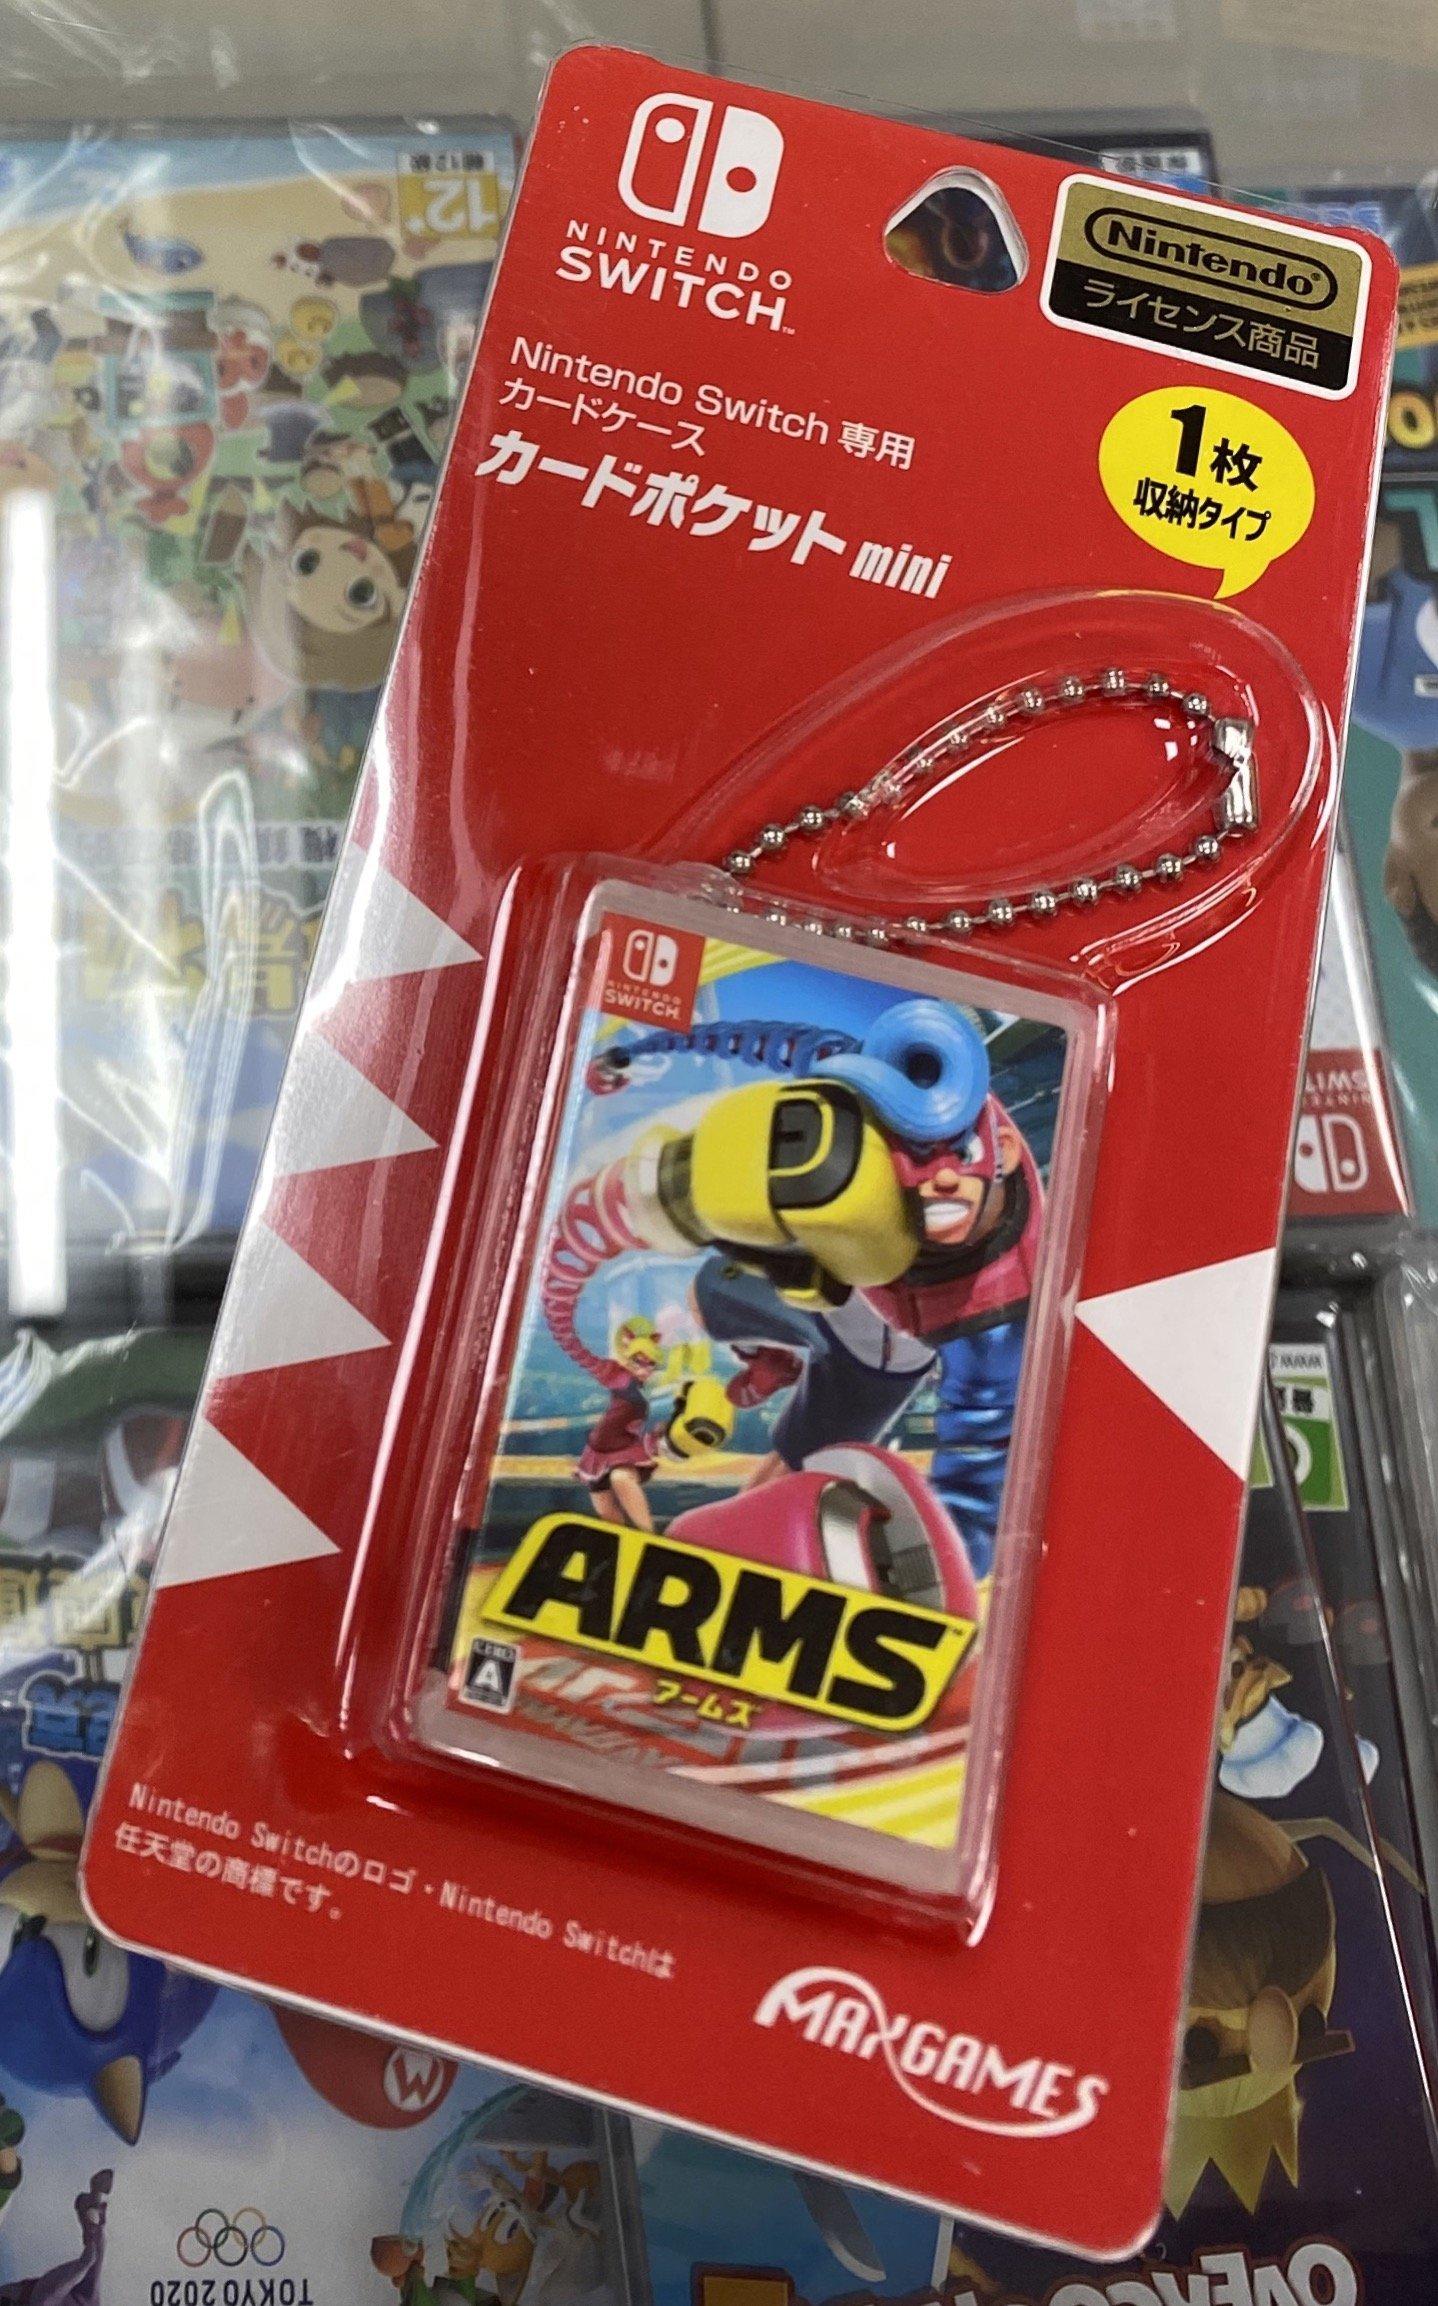 Switch NS MAXGAMES max games 迷你卡帶盒 收納盒 吊飾款 ARMS 神臂鬥士款【遊戲頻道】